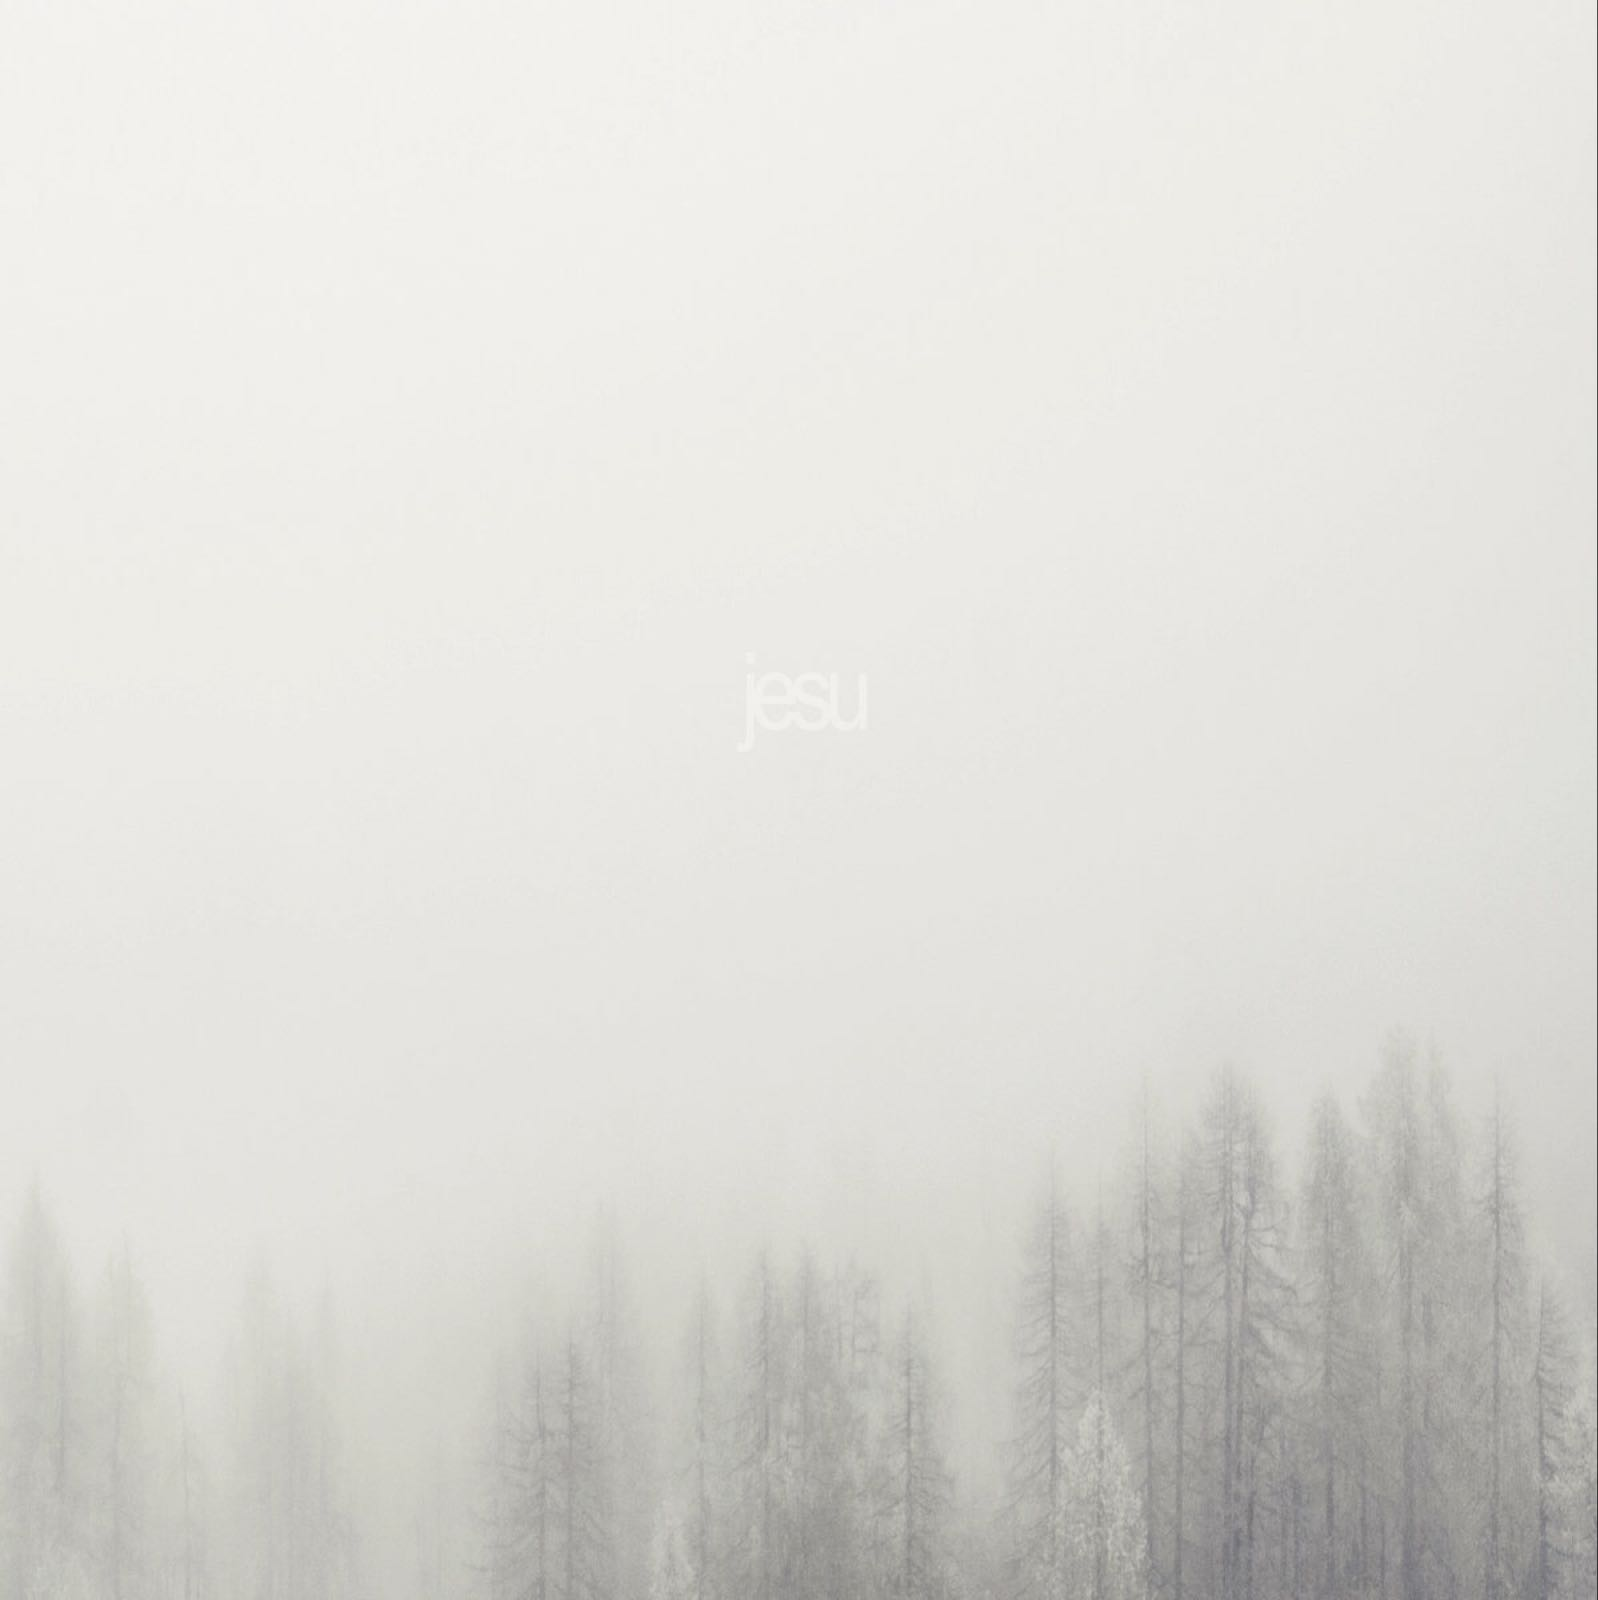 Jesu - Terminus [LP]